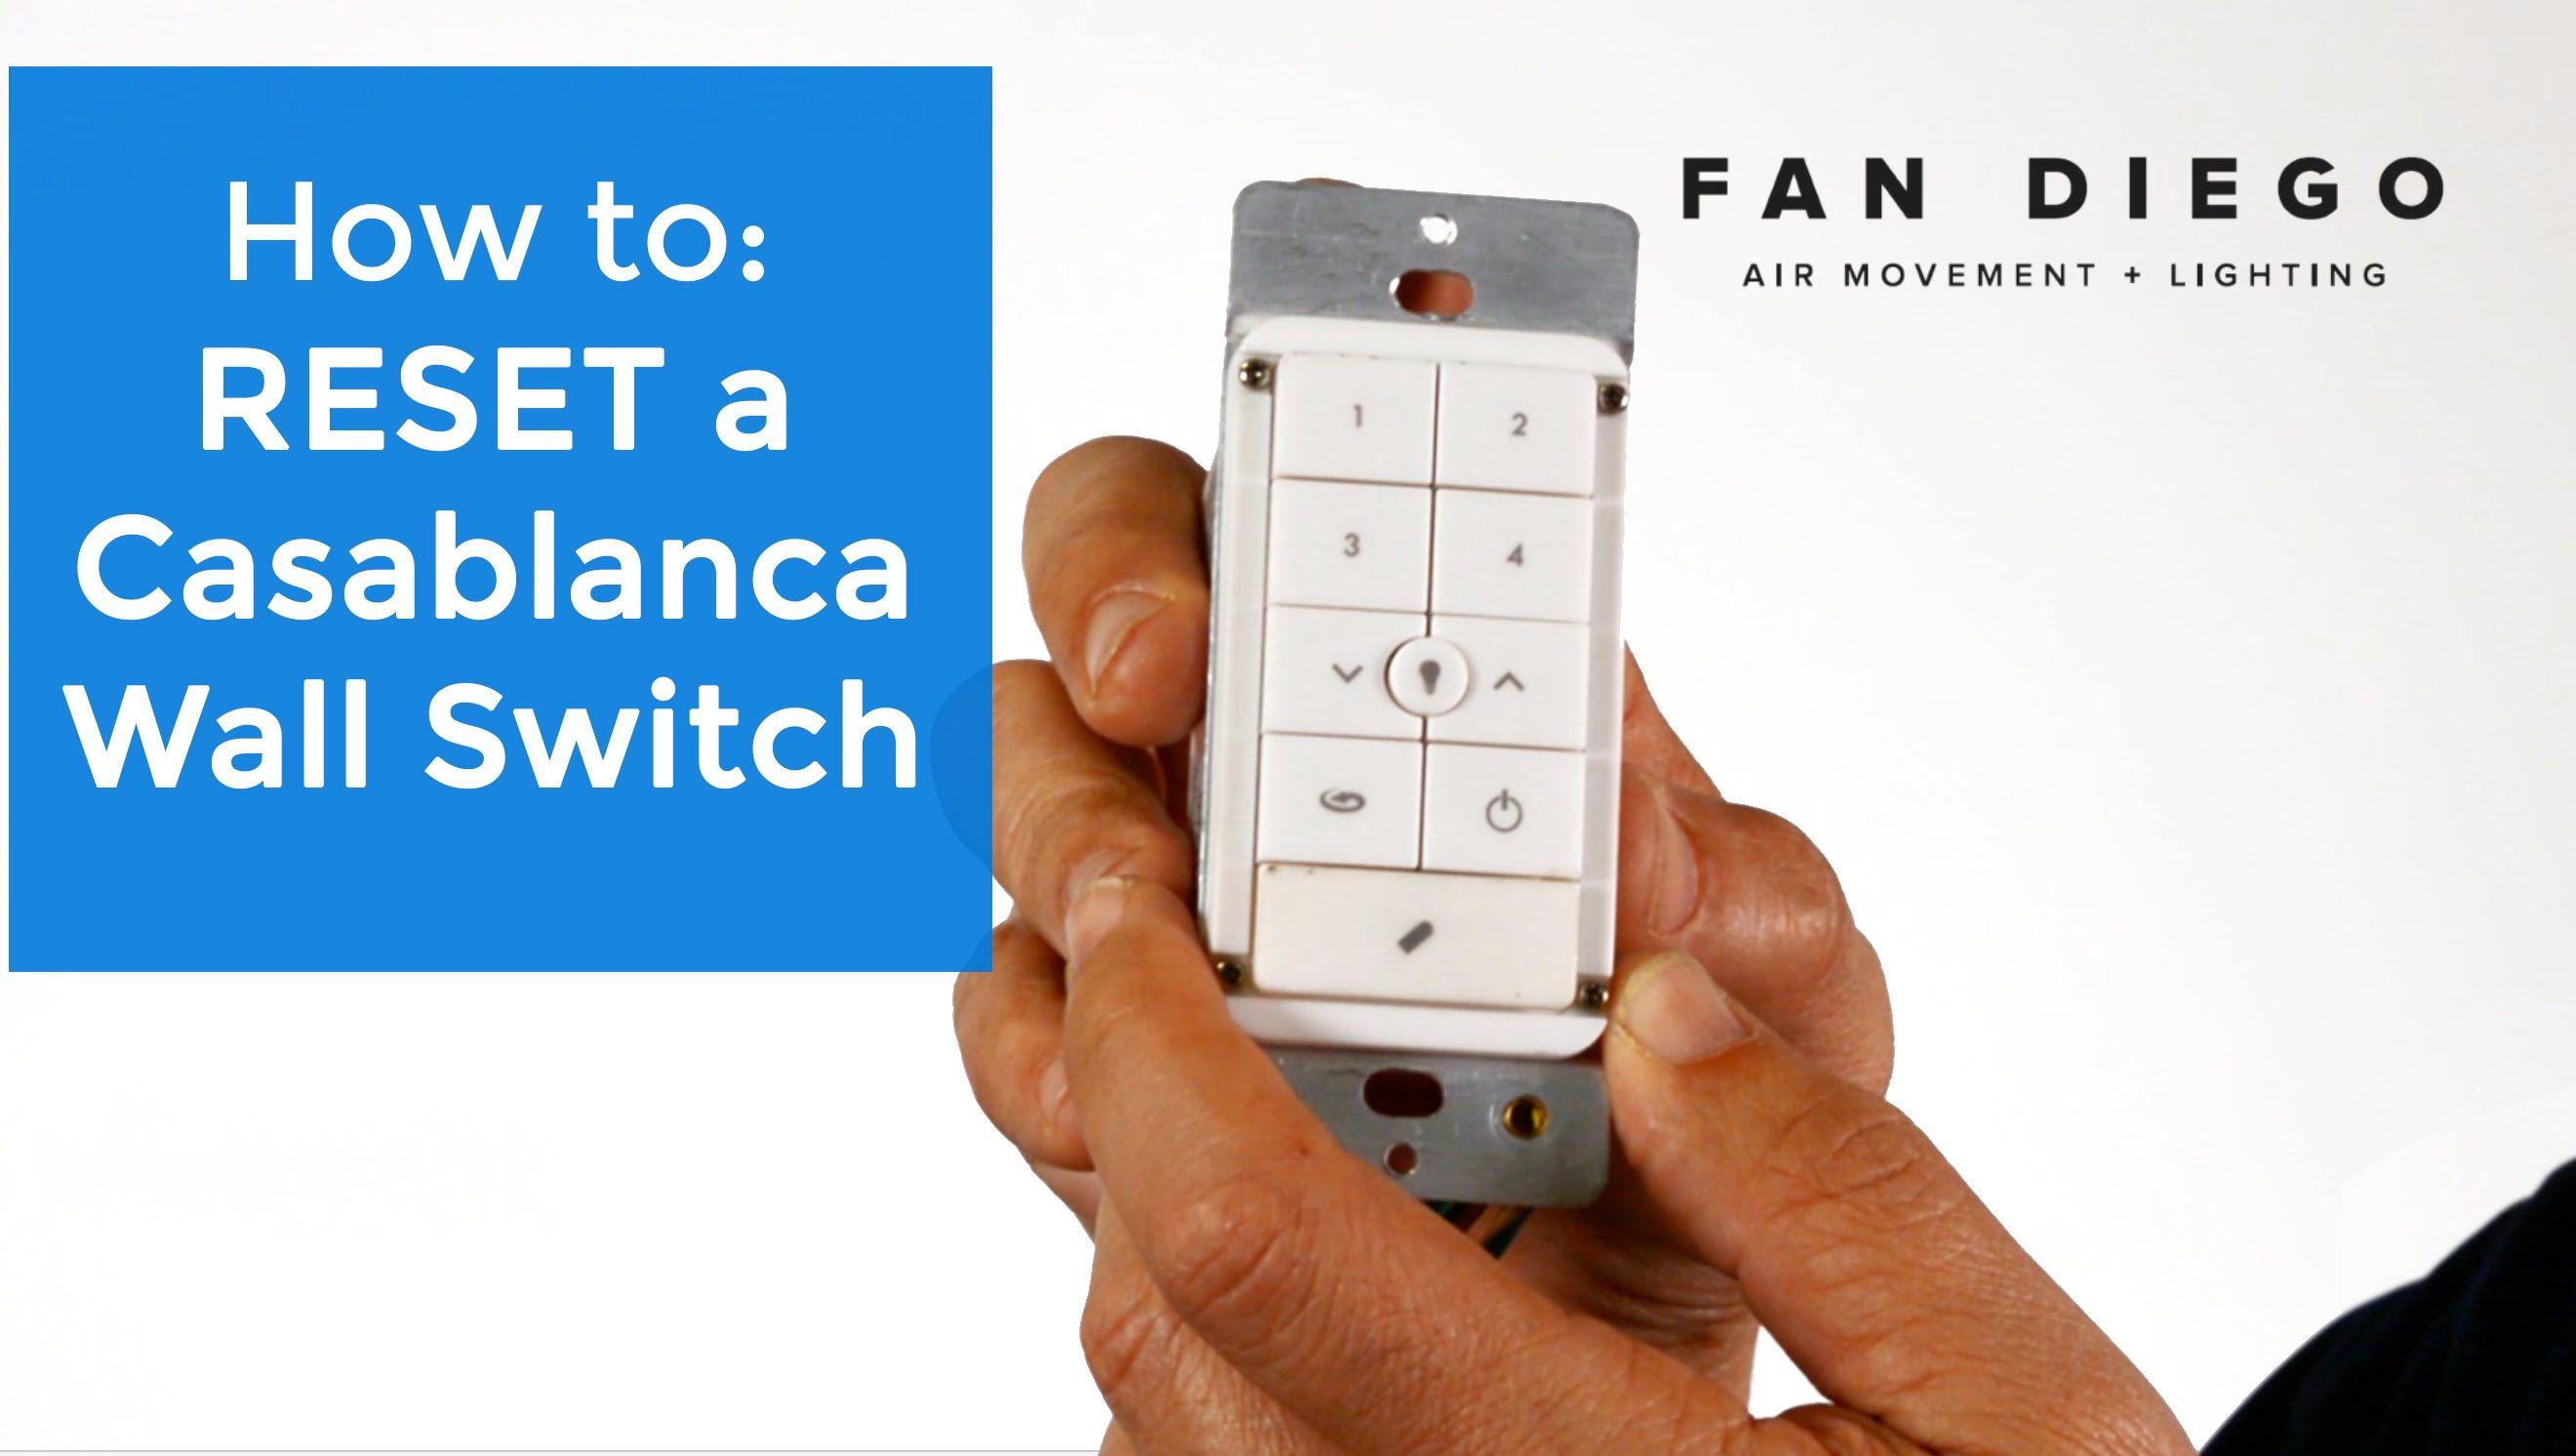 casablanca wall switch reset fan diego - Casablanca Fans